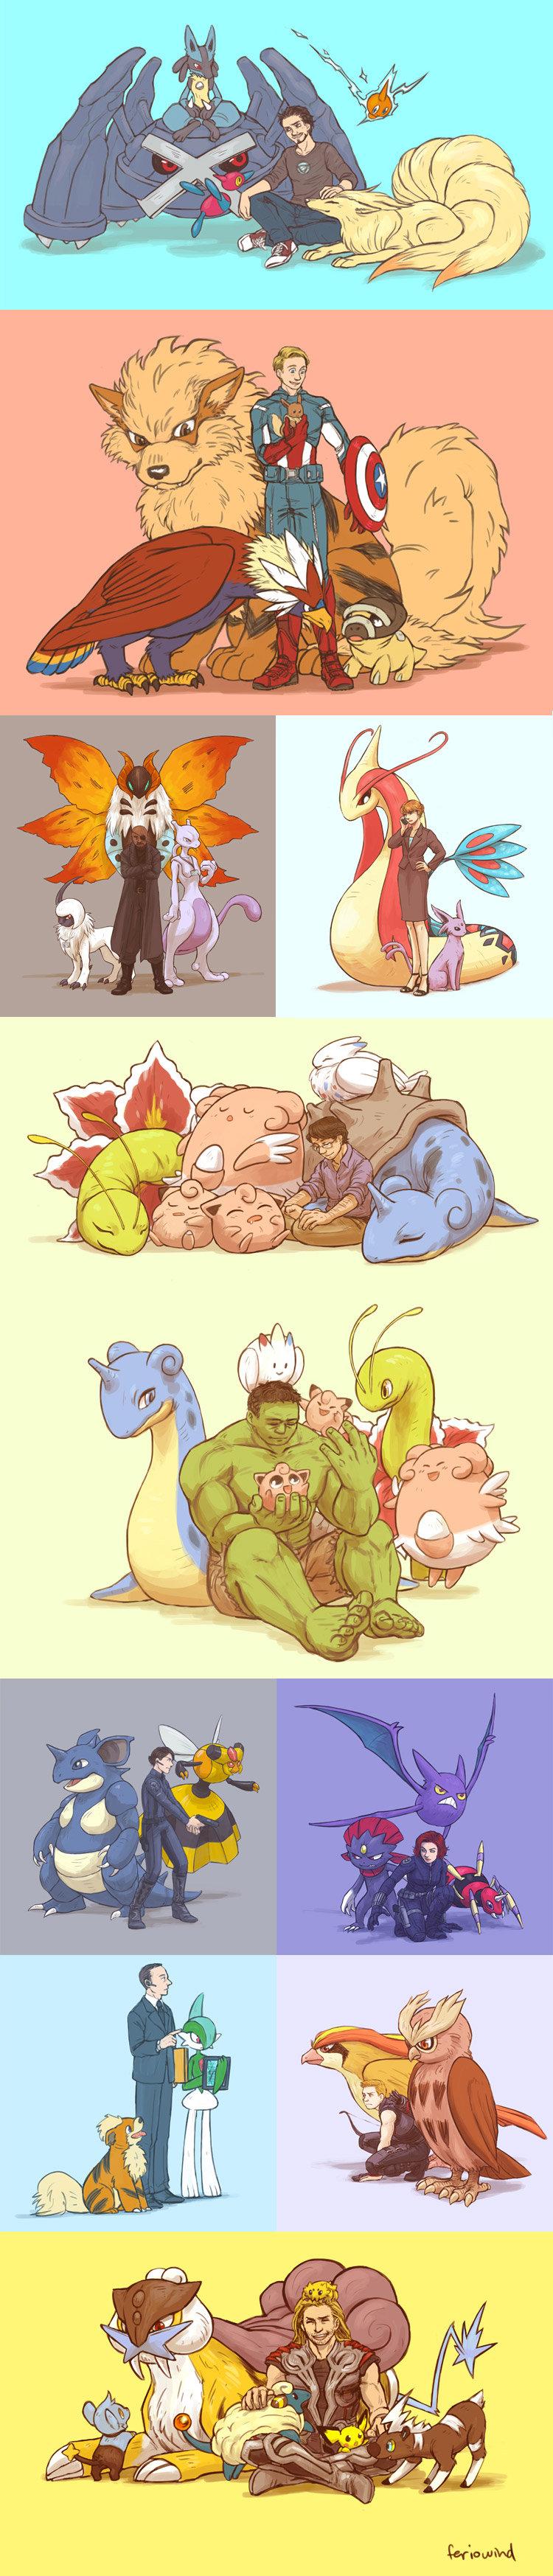 Avengers' Pokémon Assemble!. source: feriowind.deviantart.com/gallery/3800.... Pokemon avengers